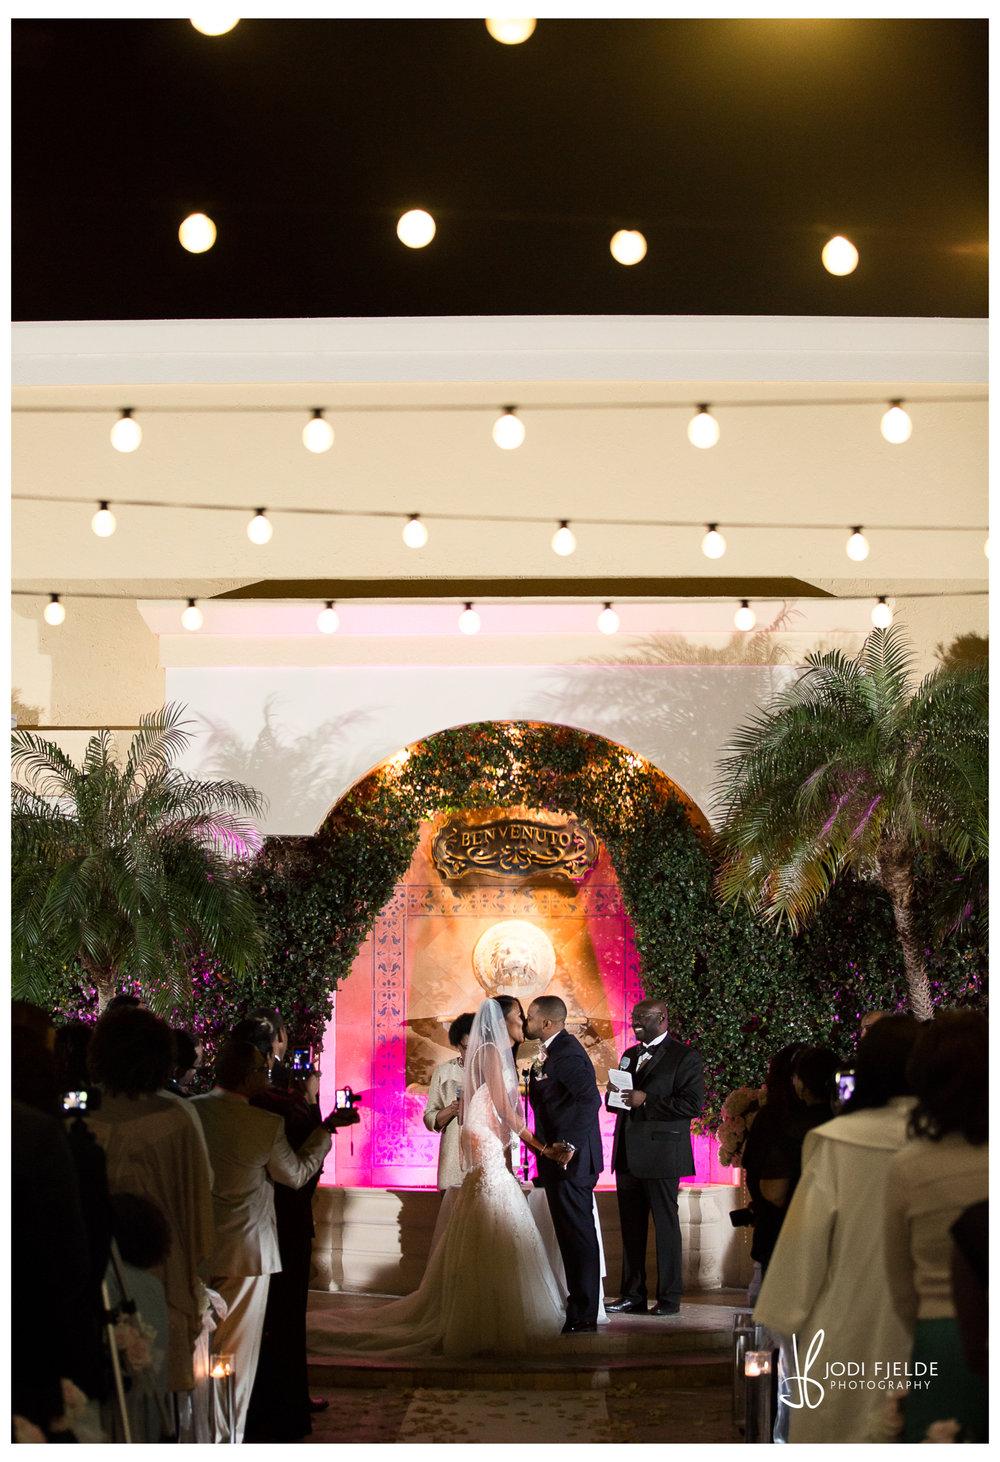 Benvenuto_wedding_Boynton_Beach_Jodi_Fjelde_Photography_Nikki_Otis_married_17.jpg